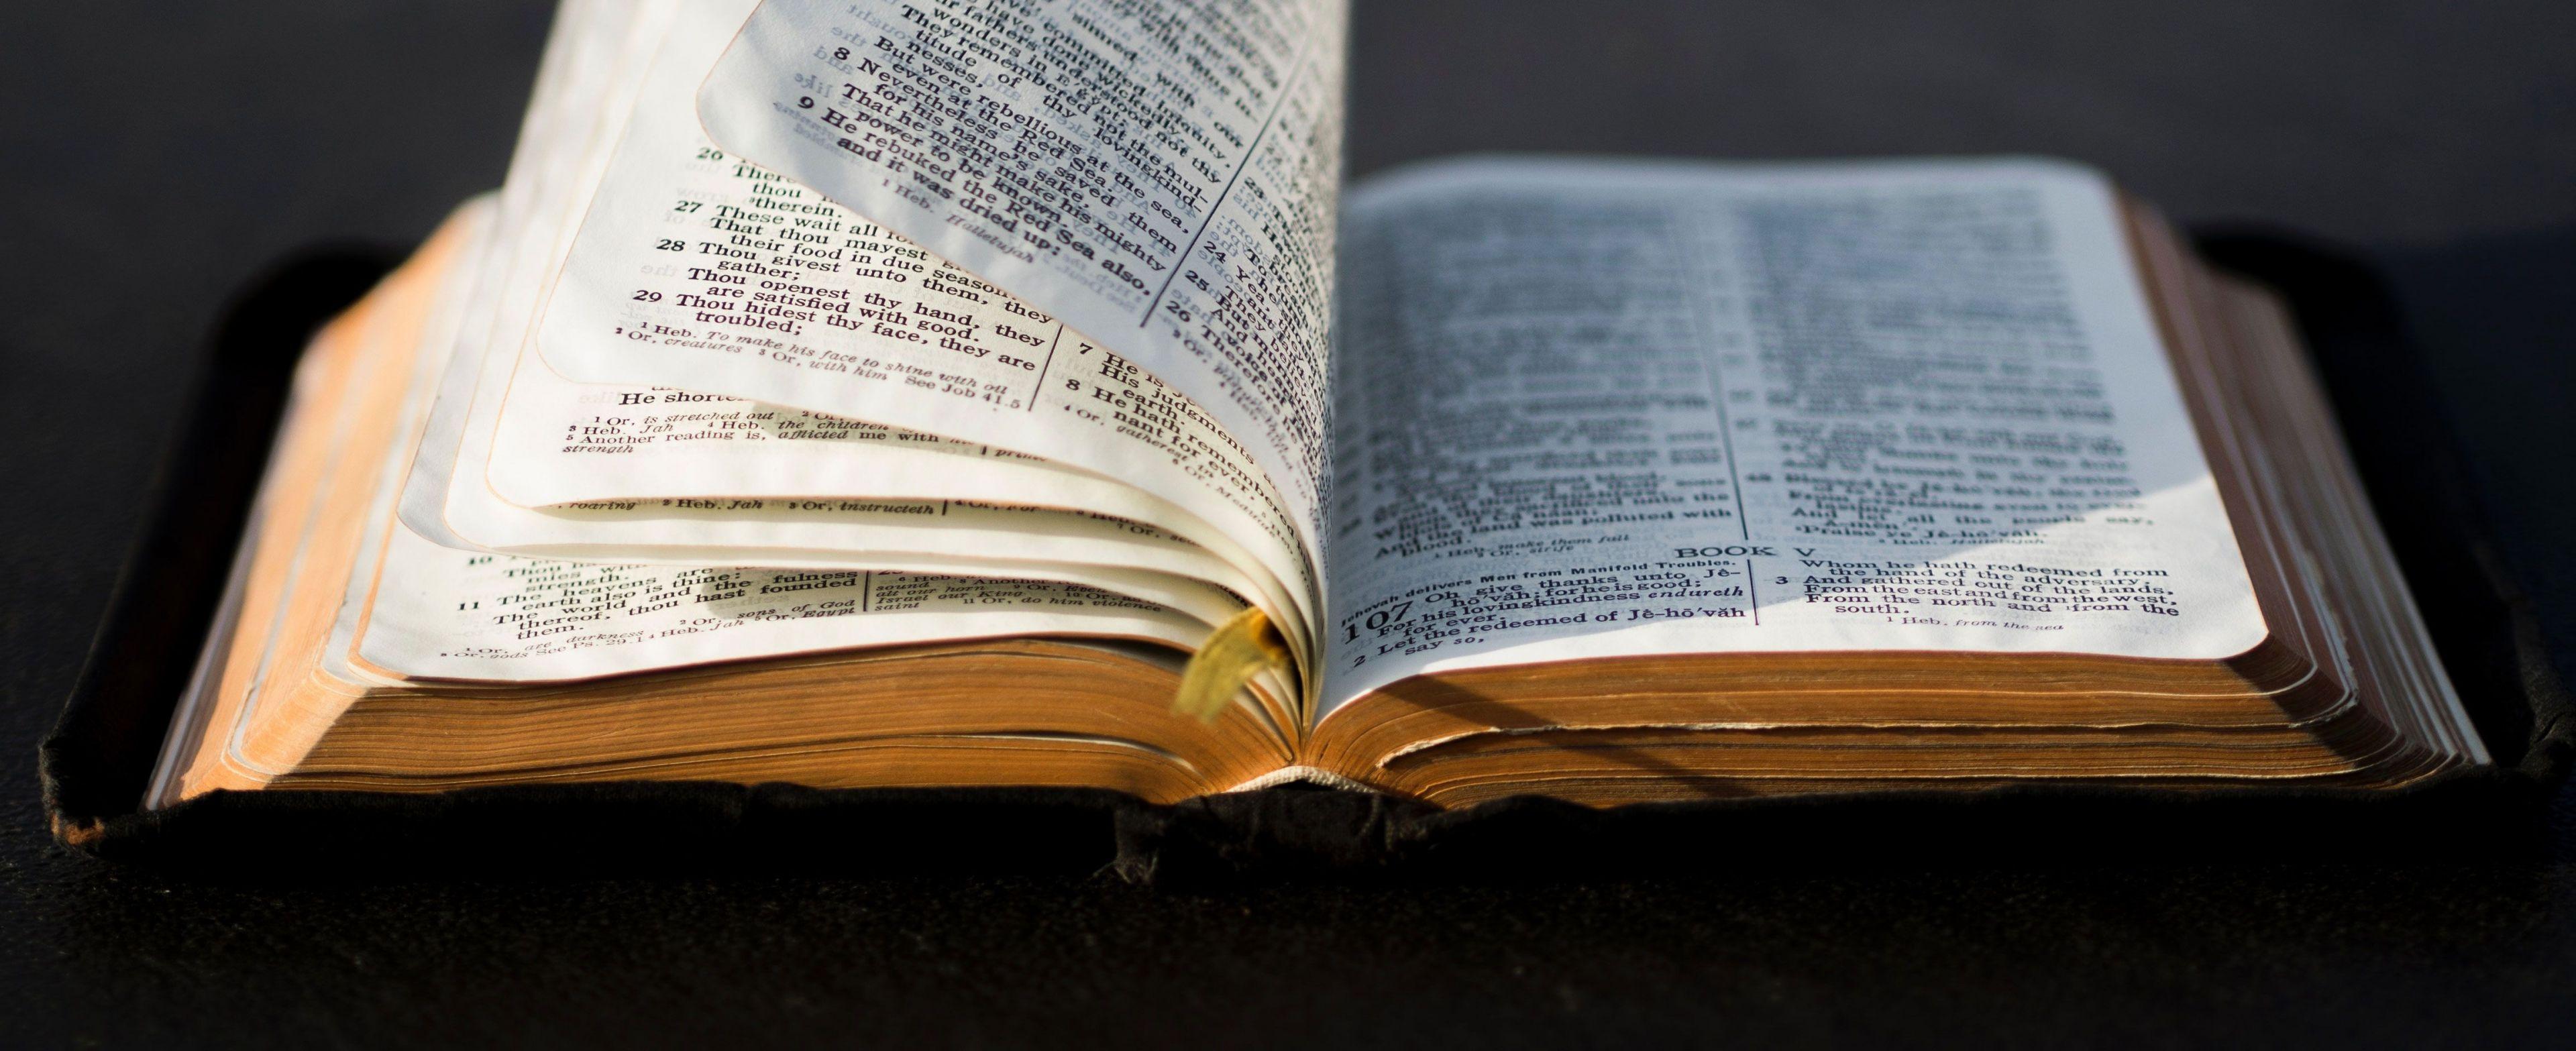 MDiv Biblical Languages 75 Hr Program